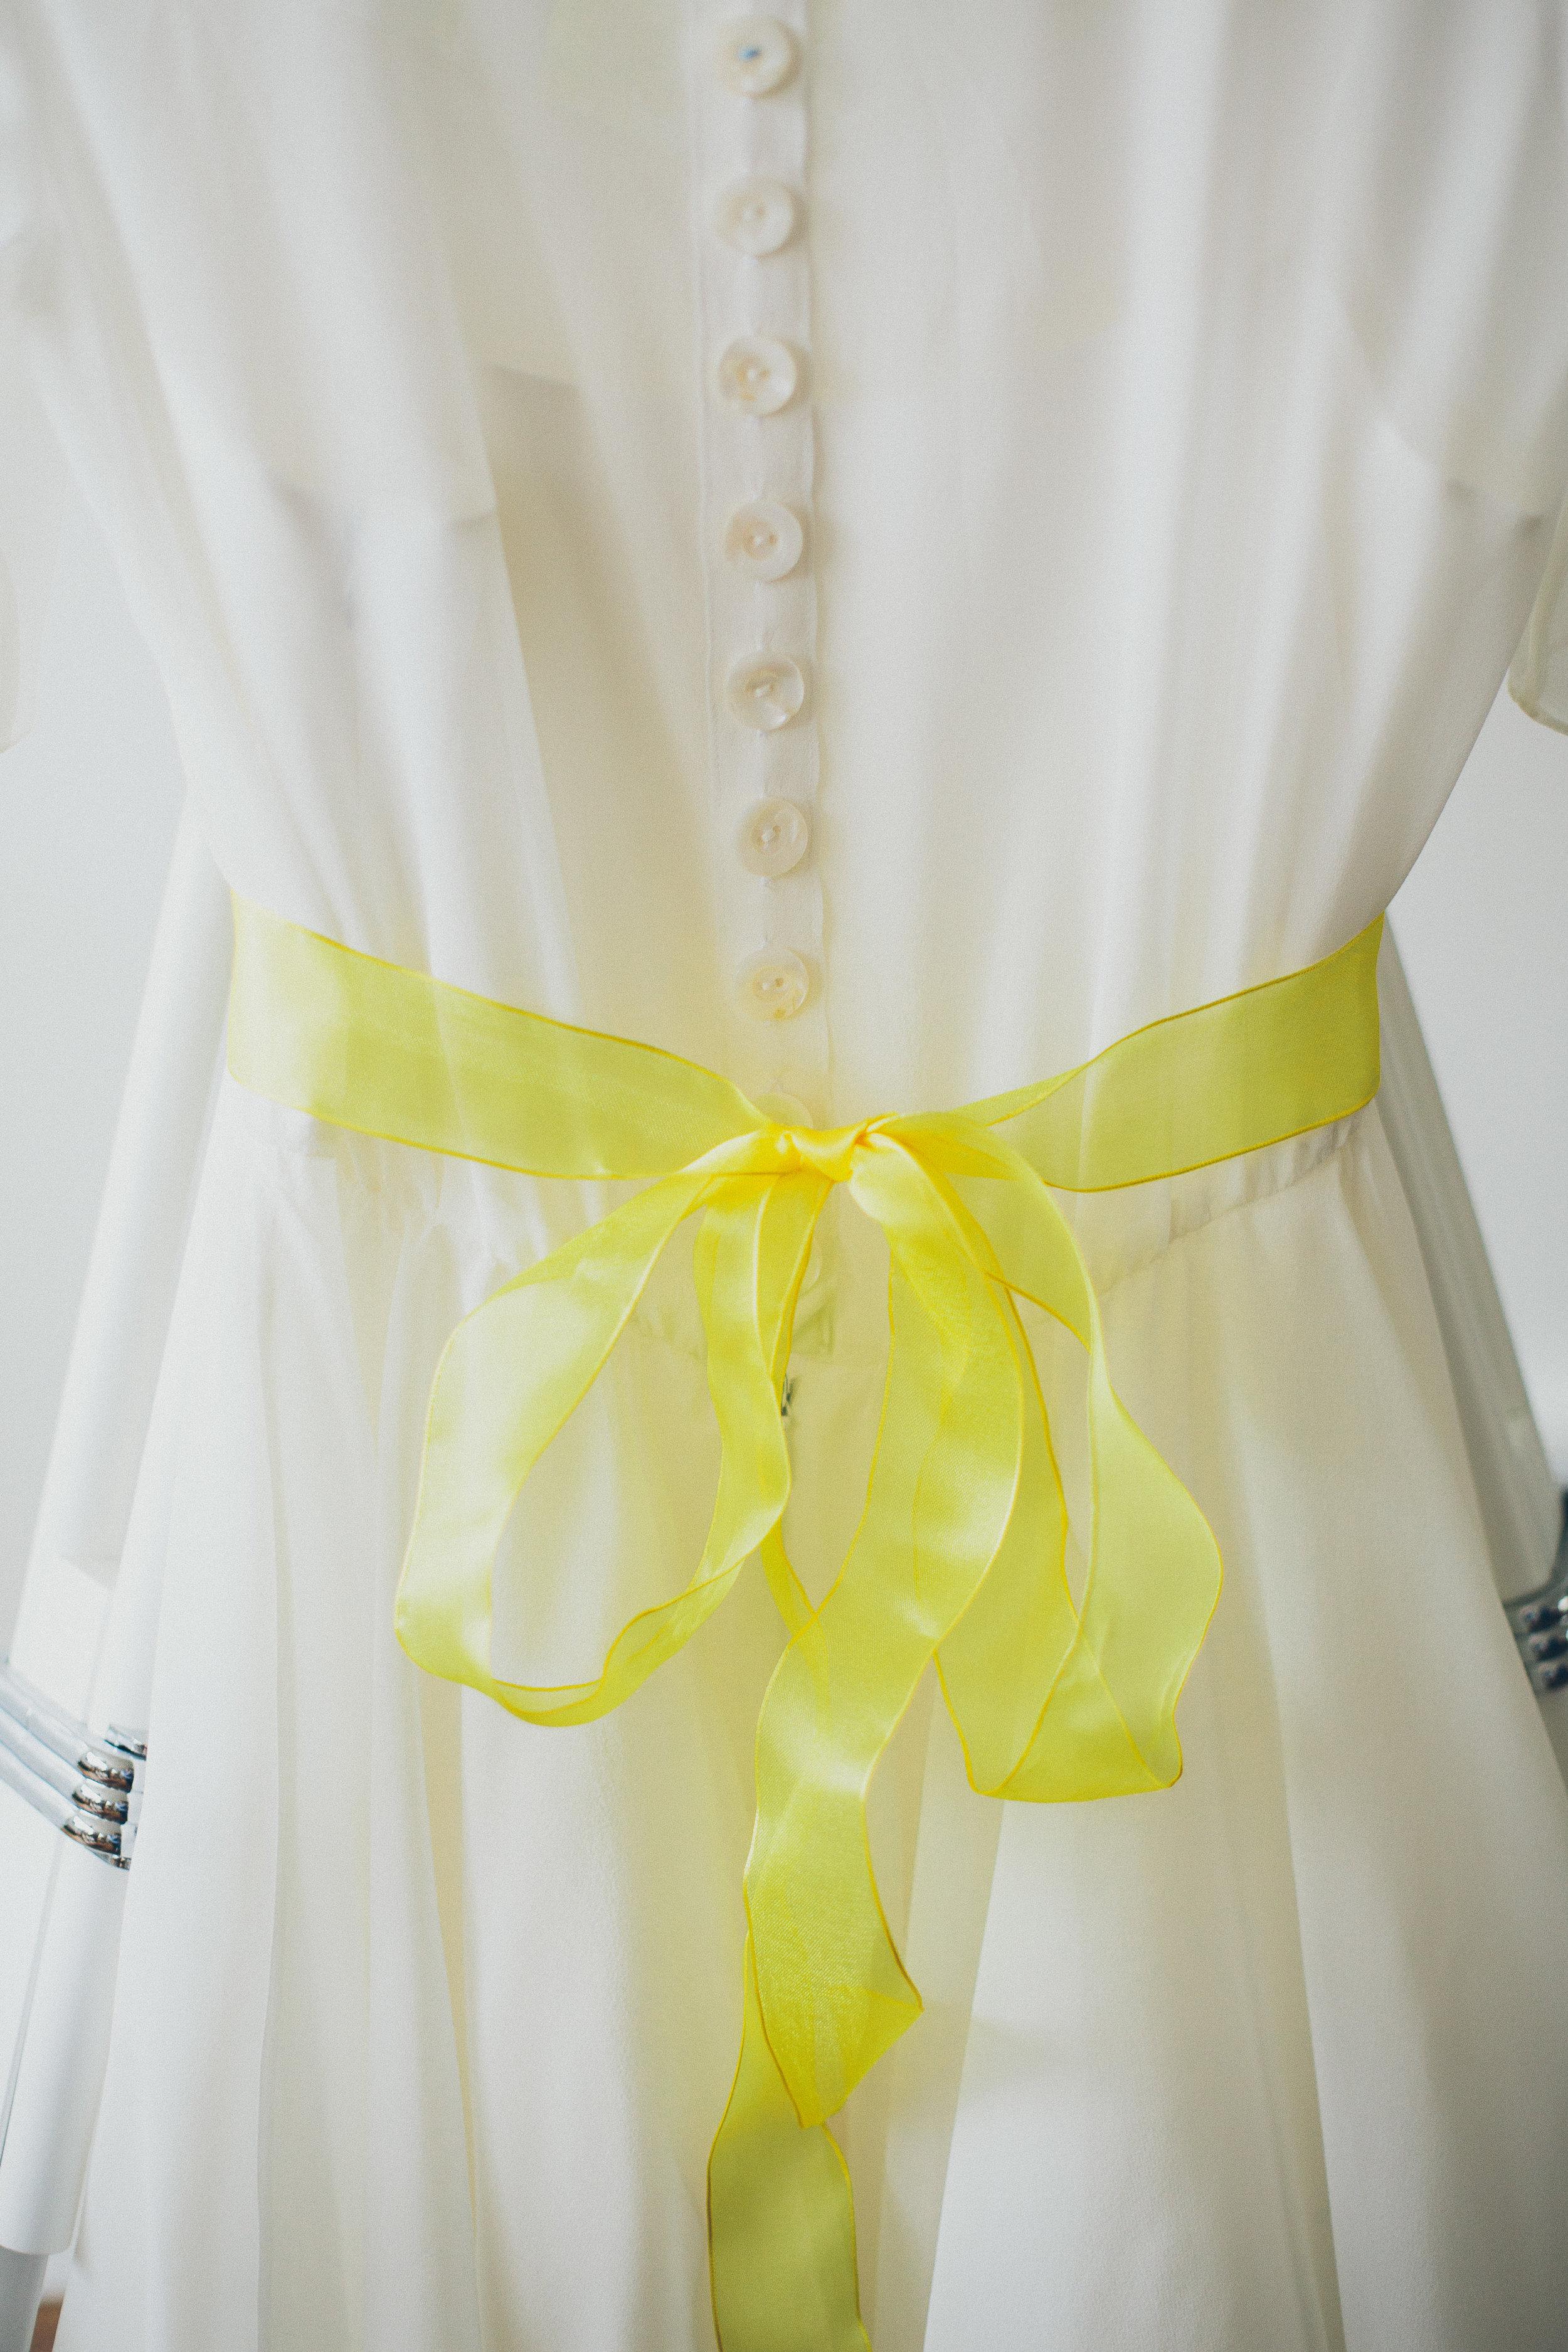 Sophie-Matlock-Bespoke-Vintage-Tea-Length-Wedding-Dress-Susanna-Greening-Derbyshire-1